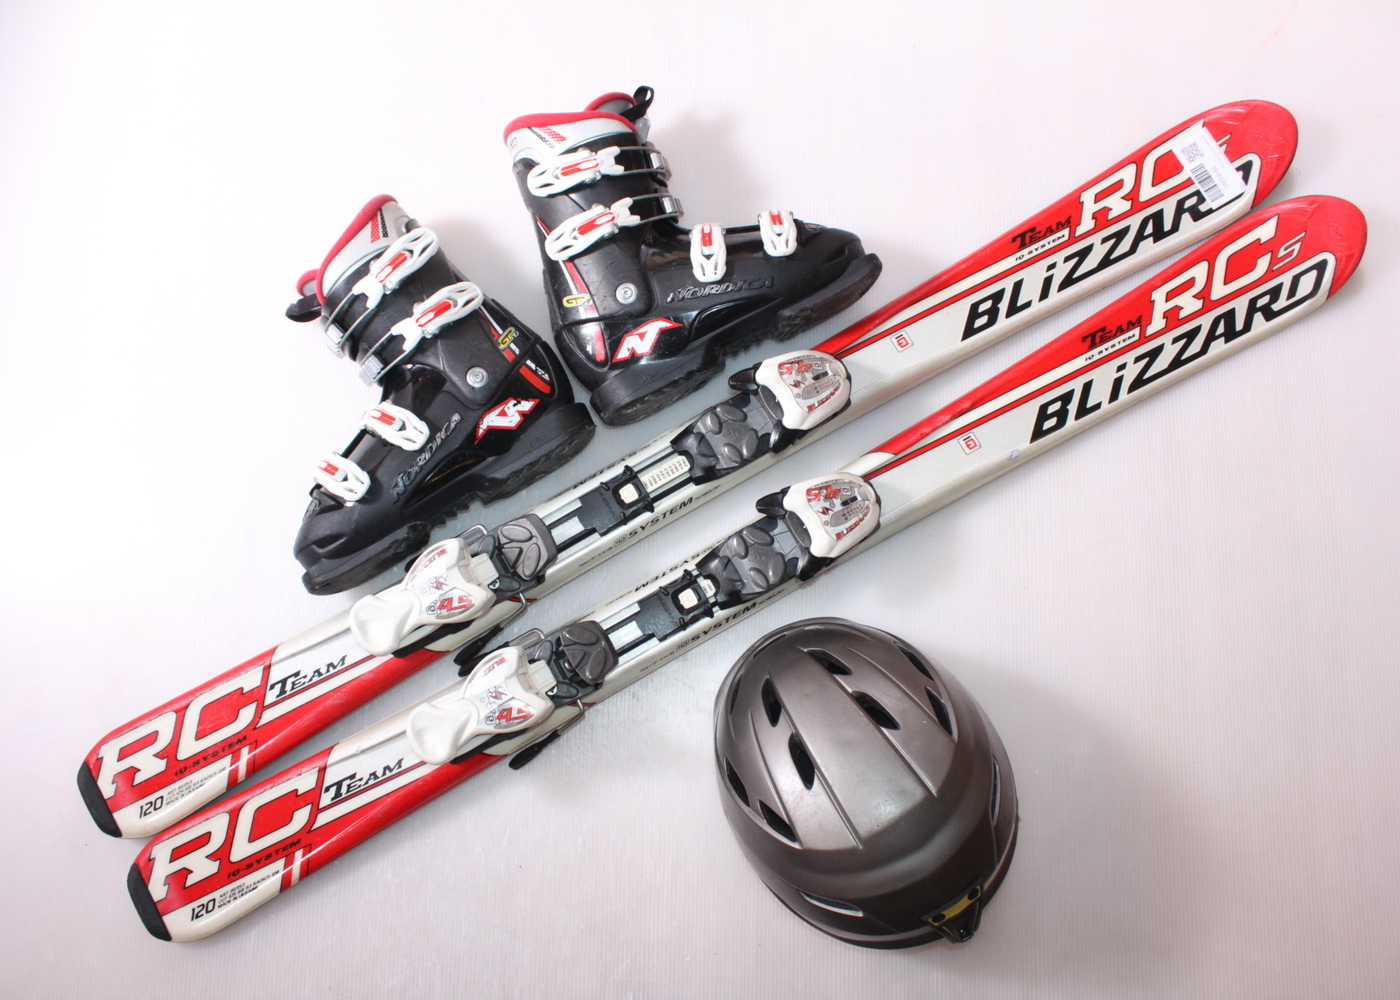 Dětské lyže BLIZZARD RCS TEAM 120 cm + lyžáky  36.5EU + helma